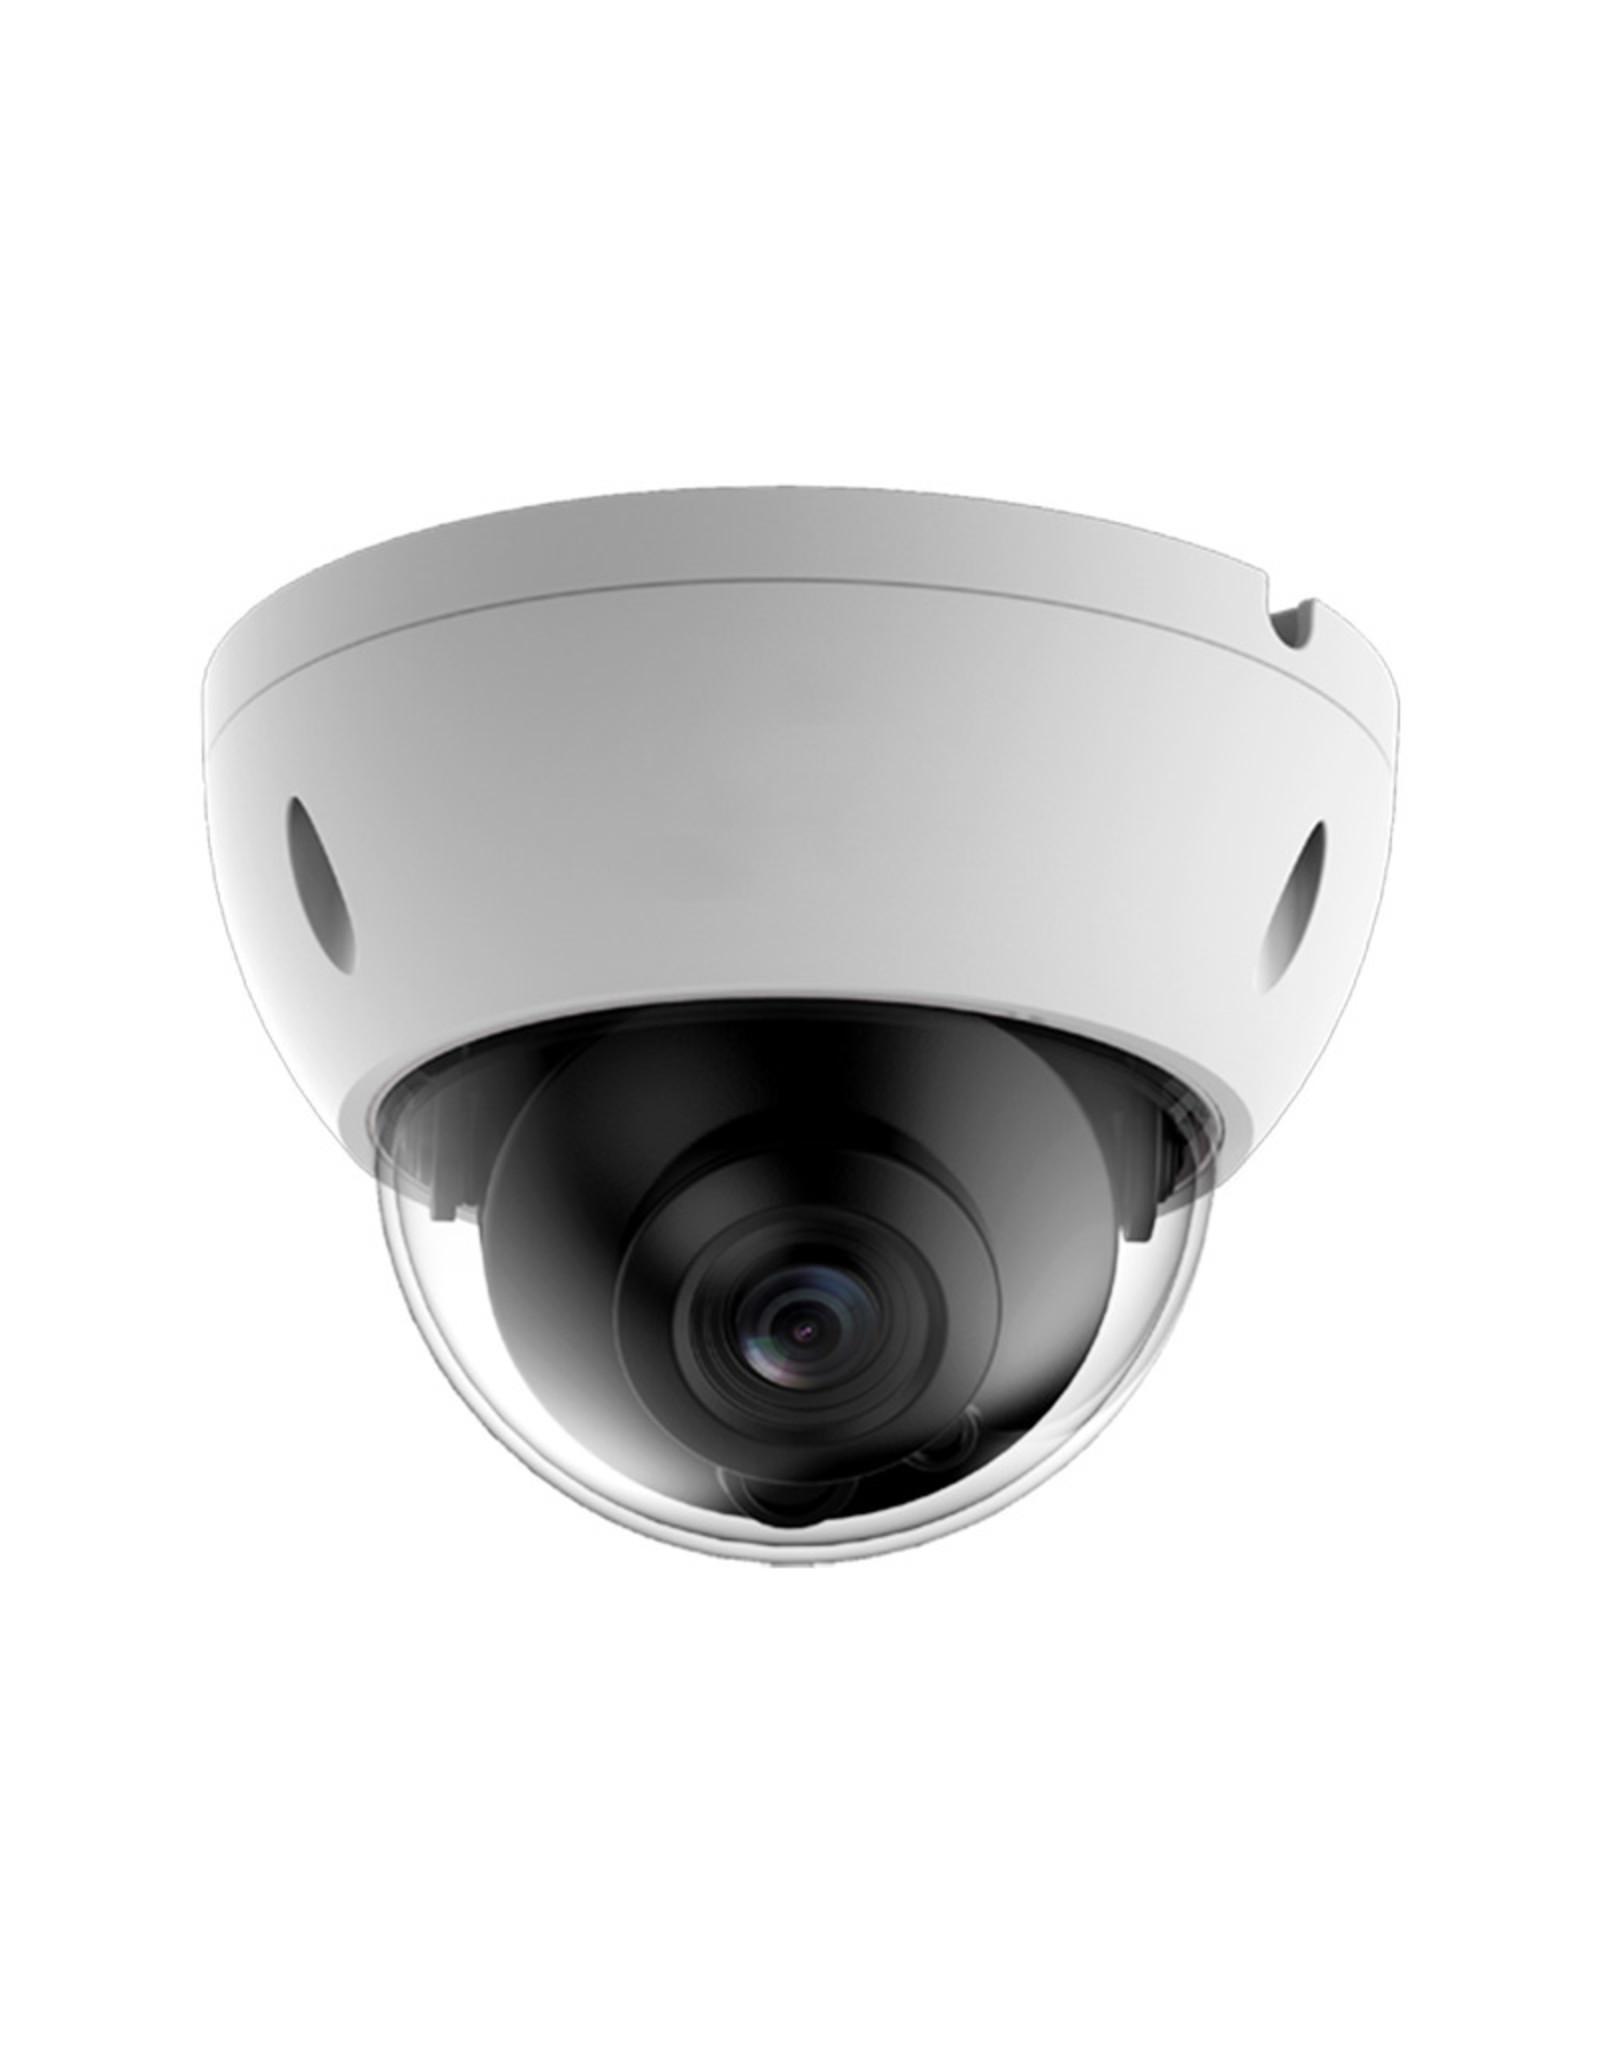 X-Security X-Security XS-IPDM844CAWH-2-EPOE